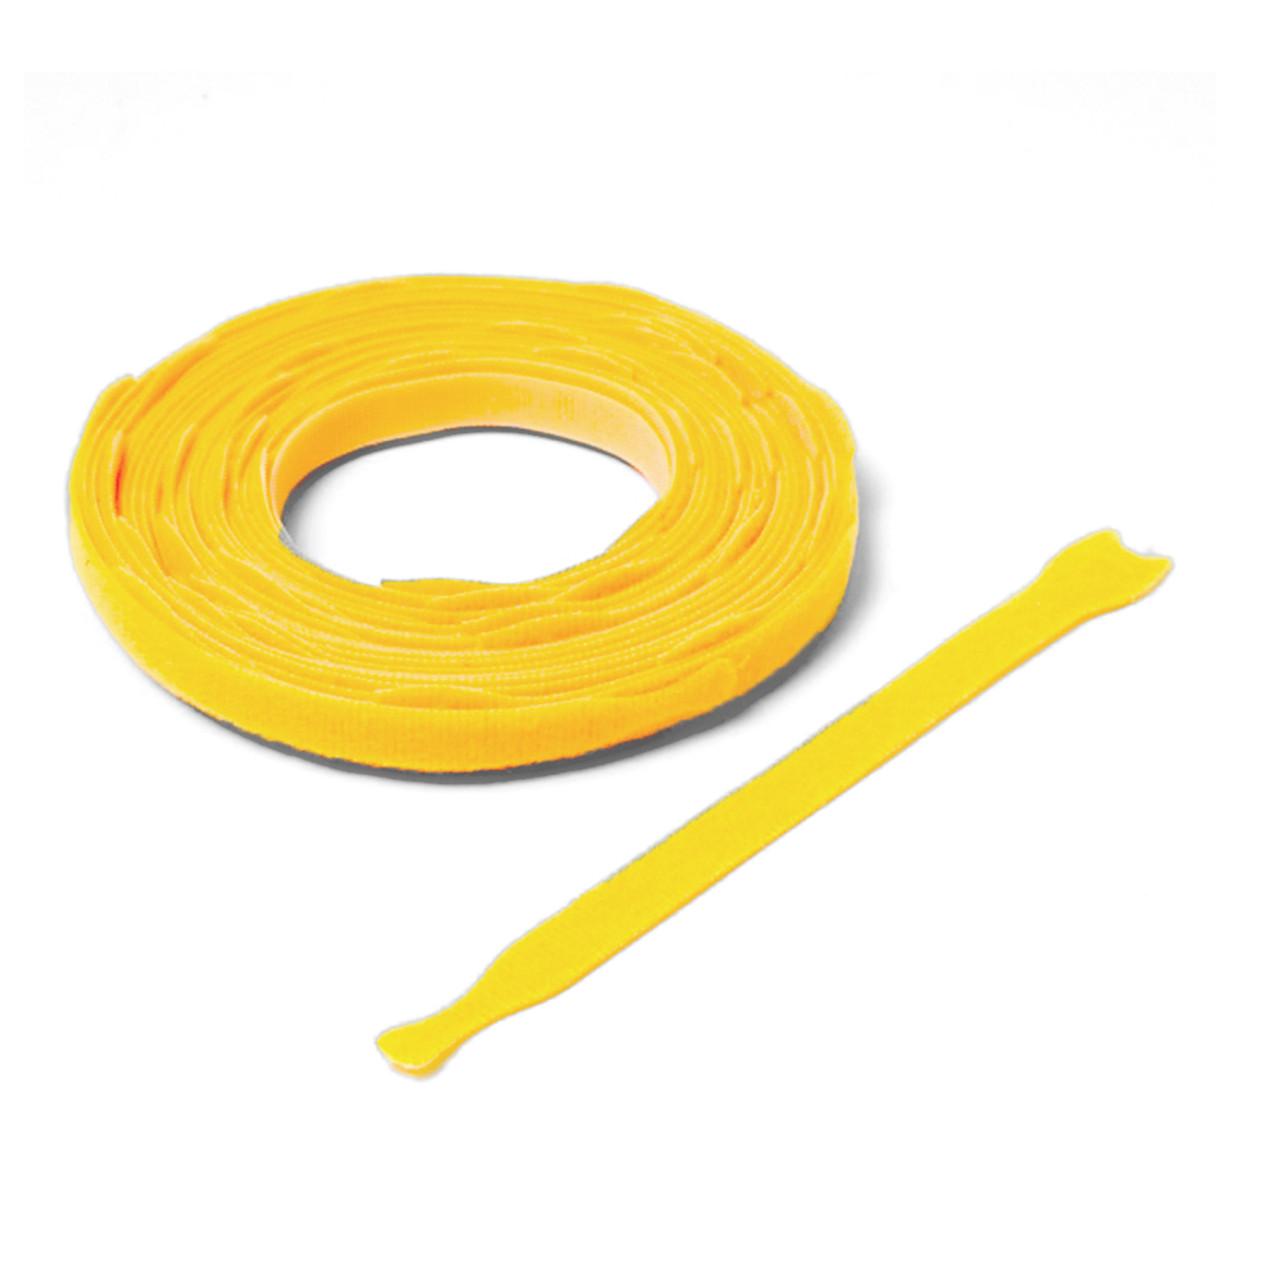 VELCRO ® Brand ONE-WRAP ® Die-Cut Straps - Yellow